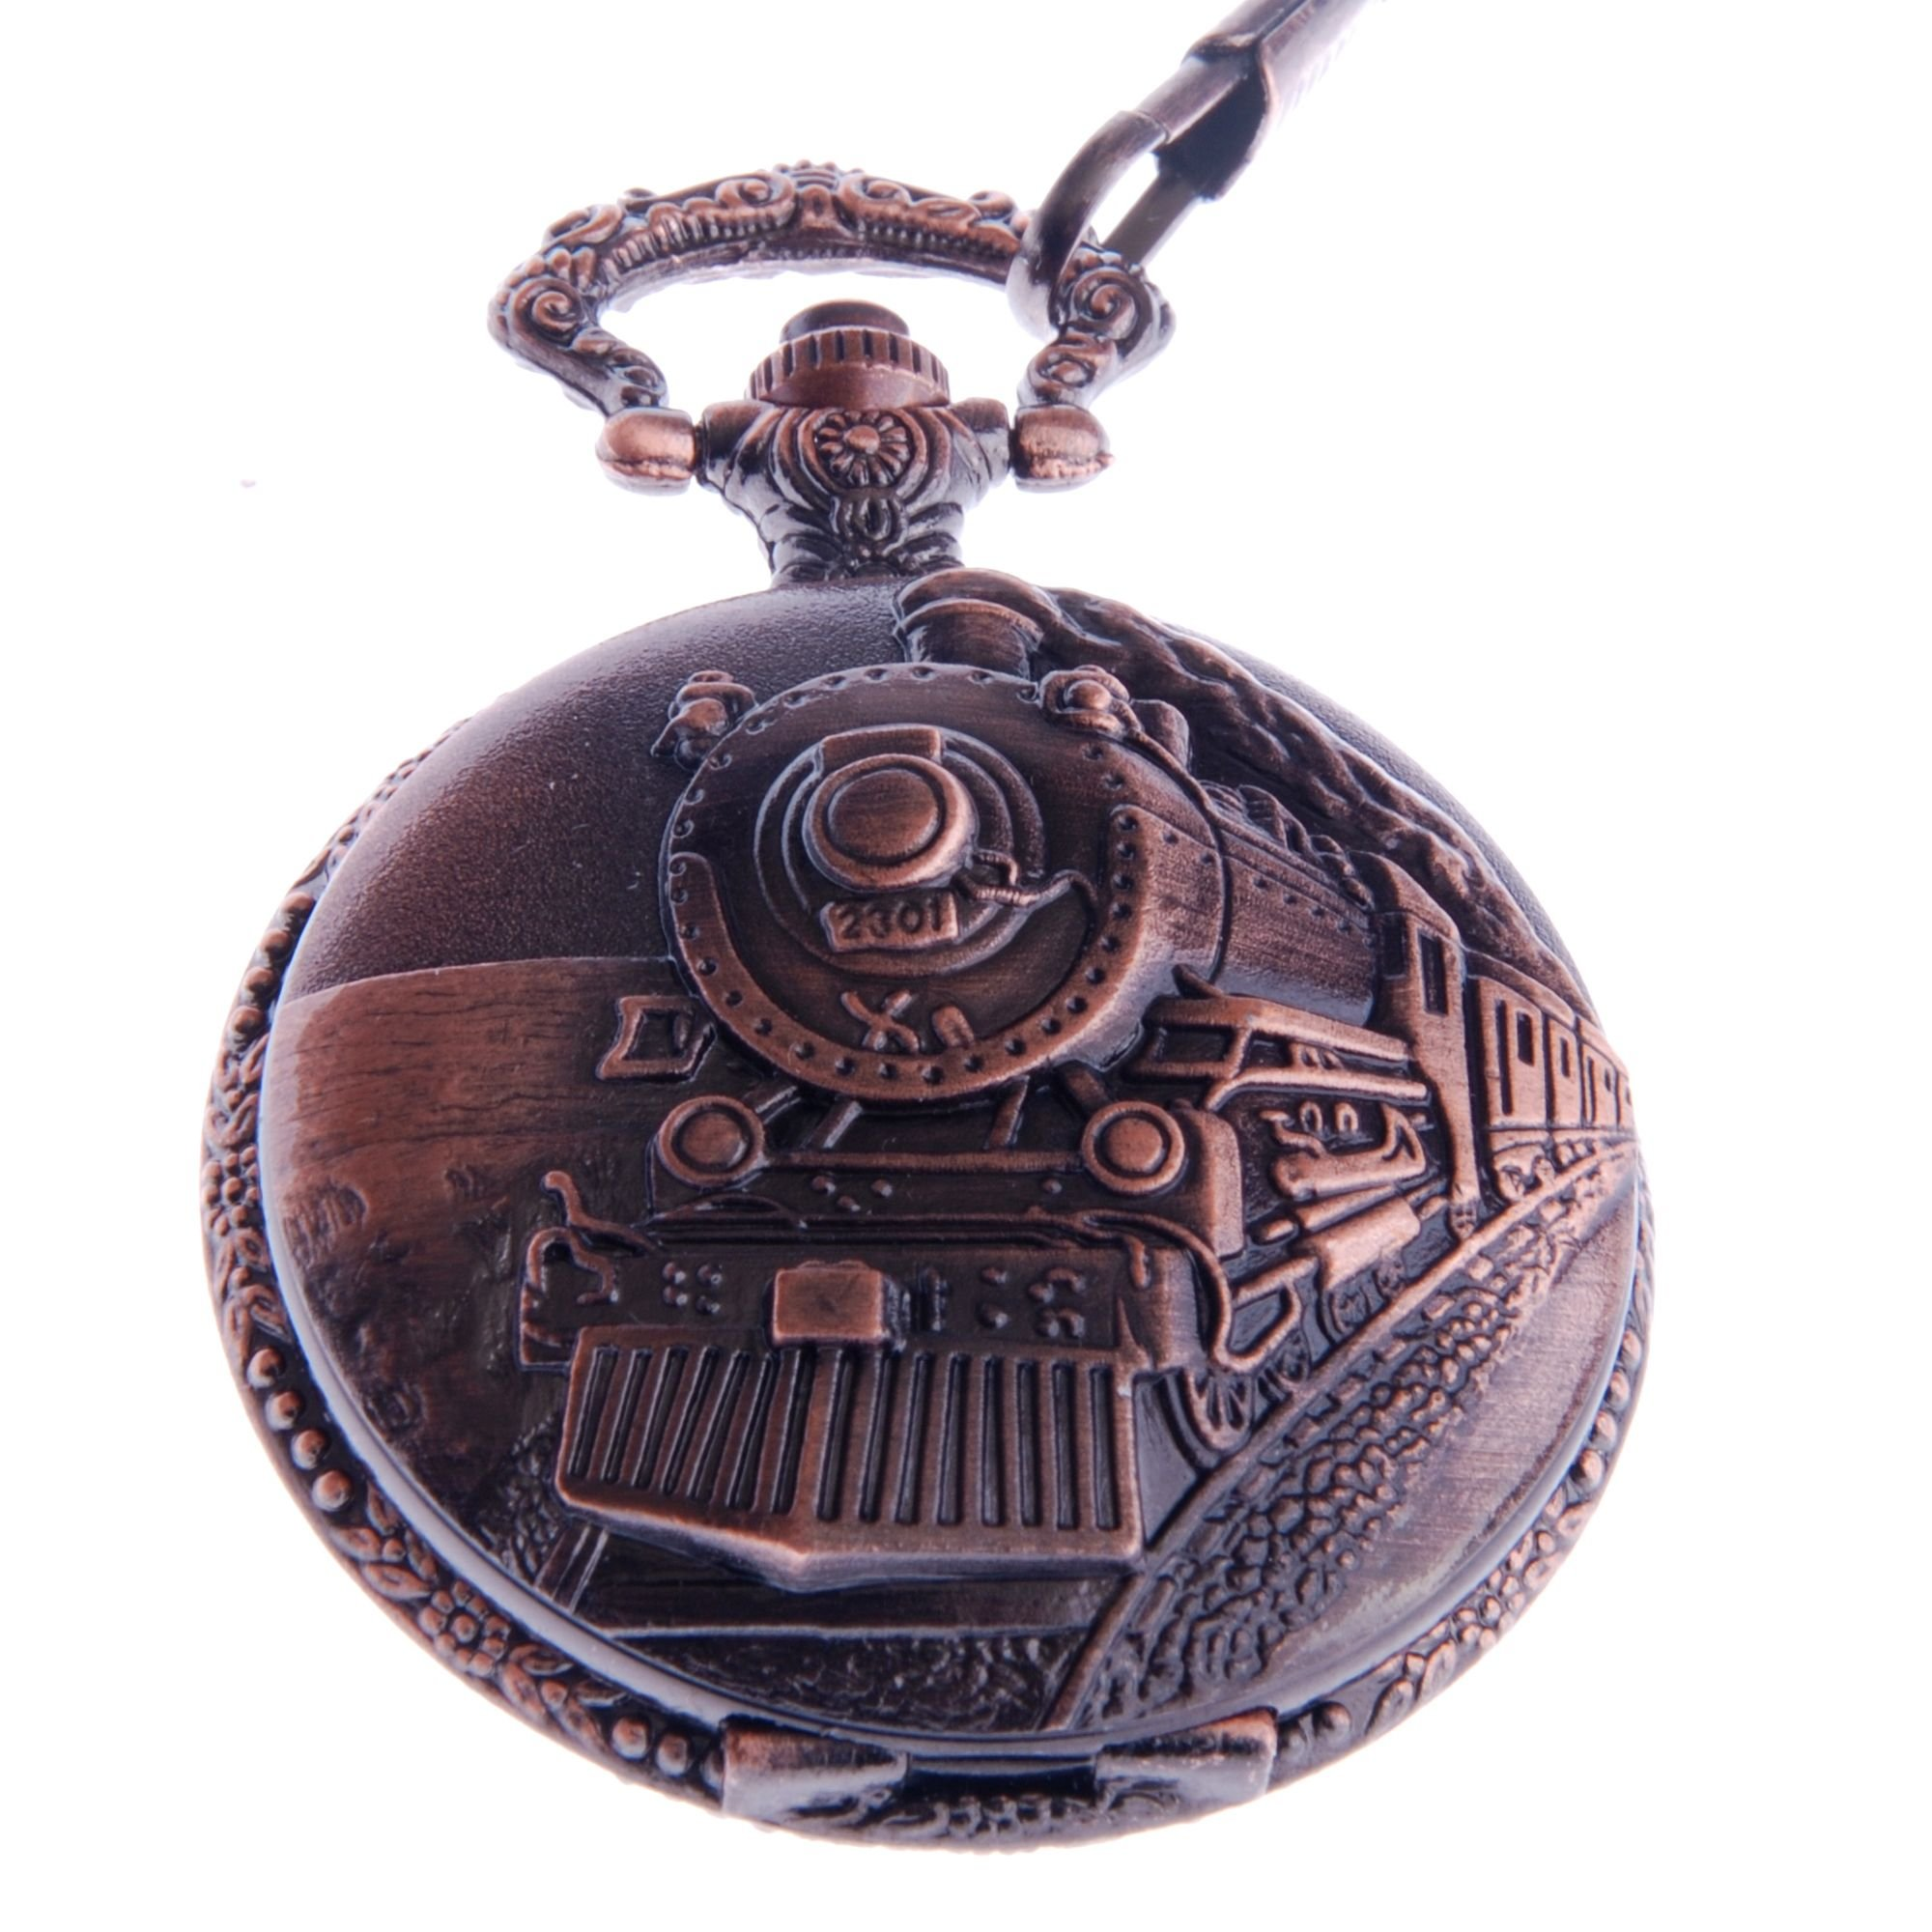 ShoppeWatch Pocket Watch with Chain Railroad Train Full Hunter Locomotive Steampunk Design PW-31